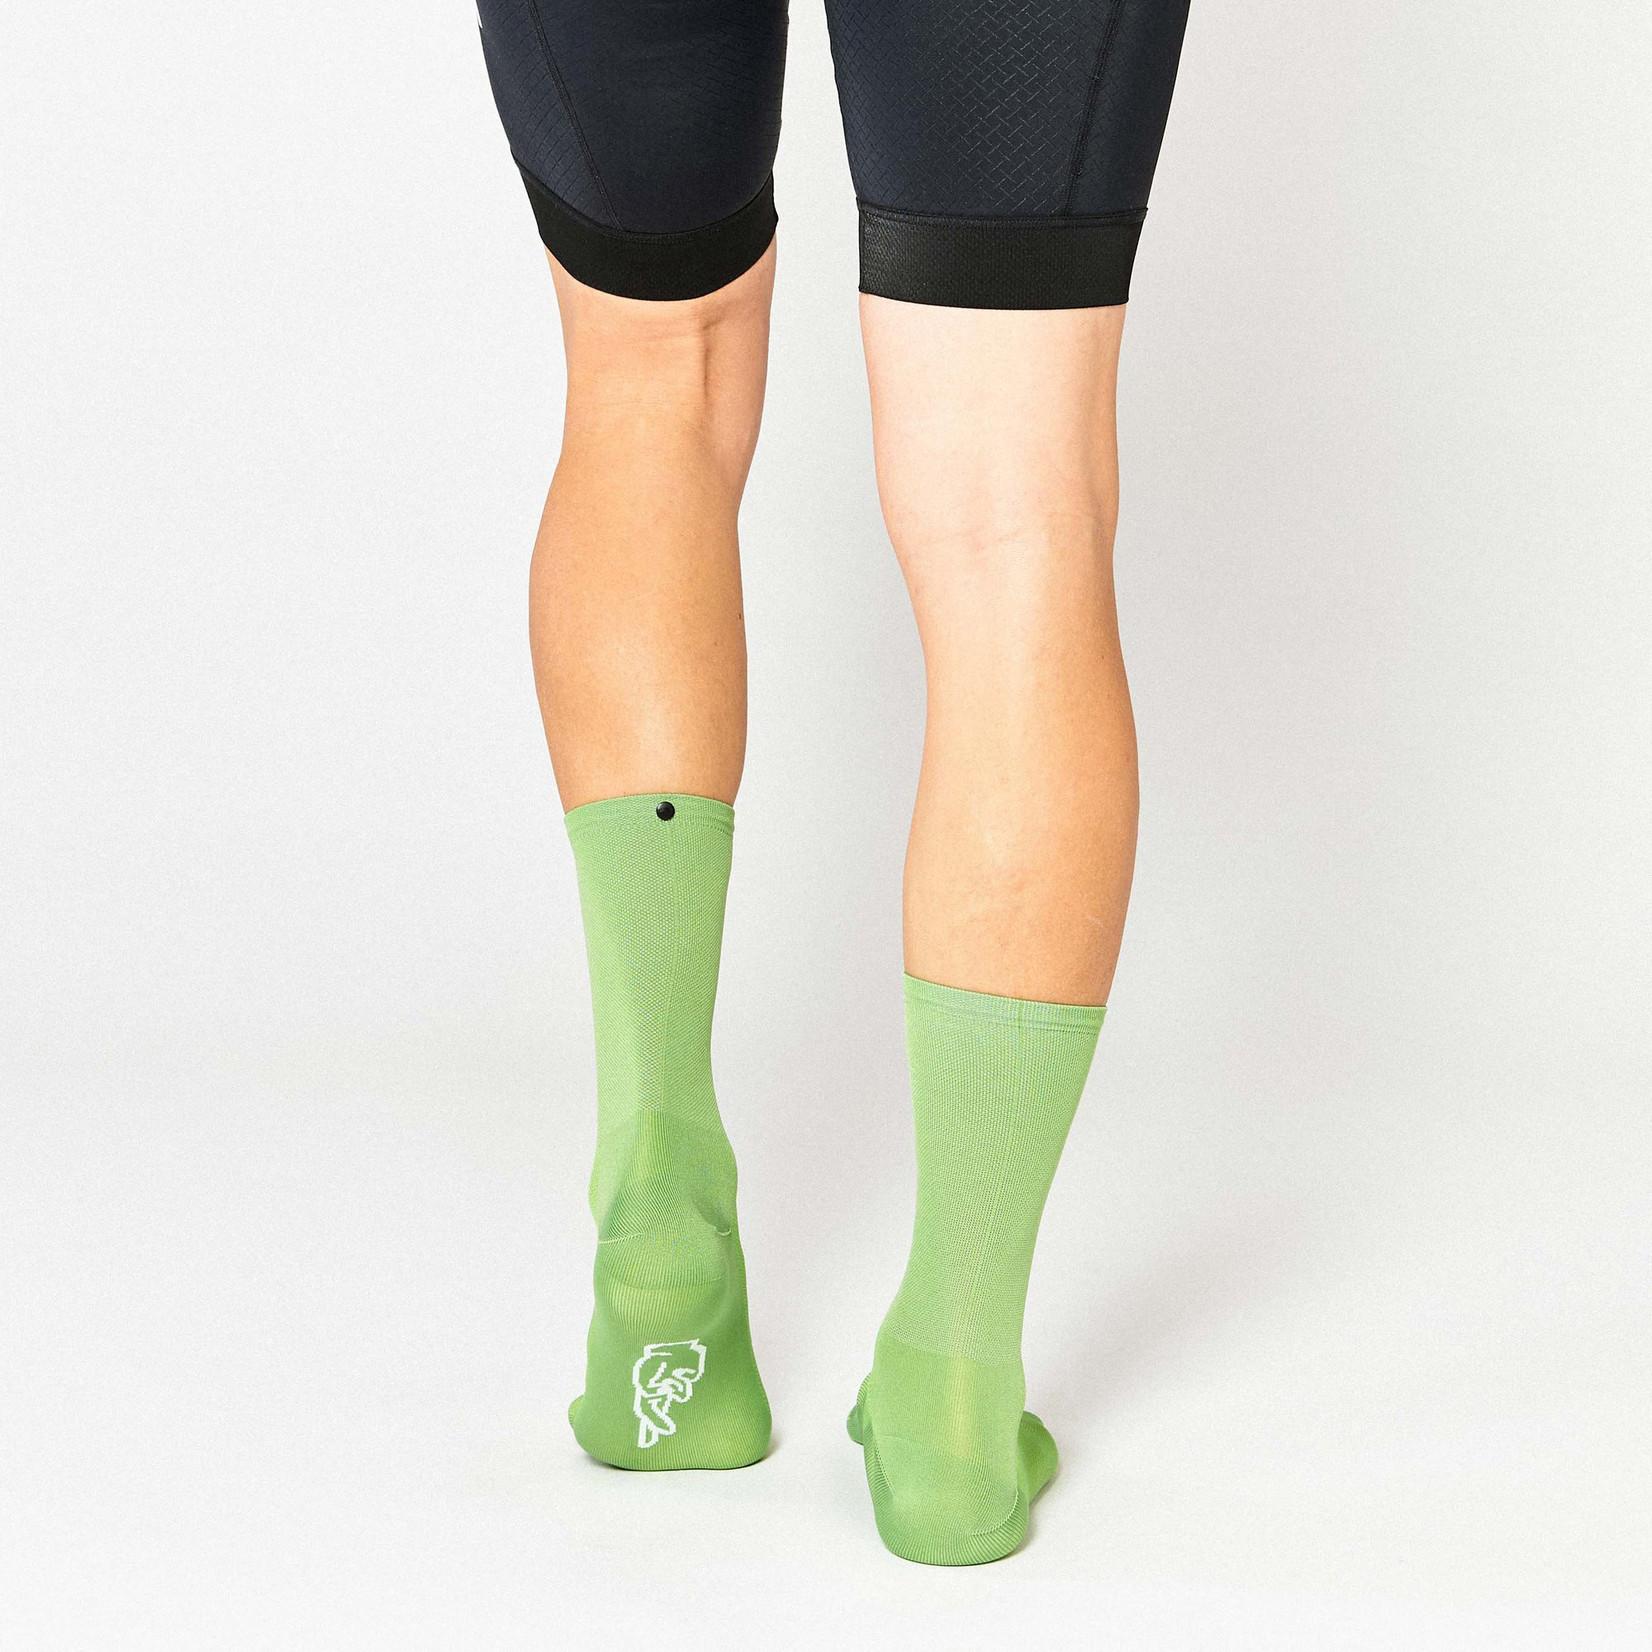 Fingerscrossed FINGERSCROSSED Classic Socks - Jade